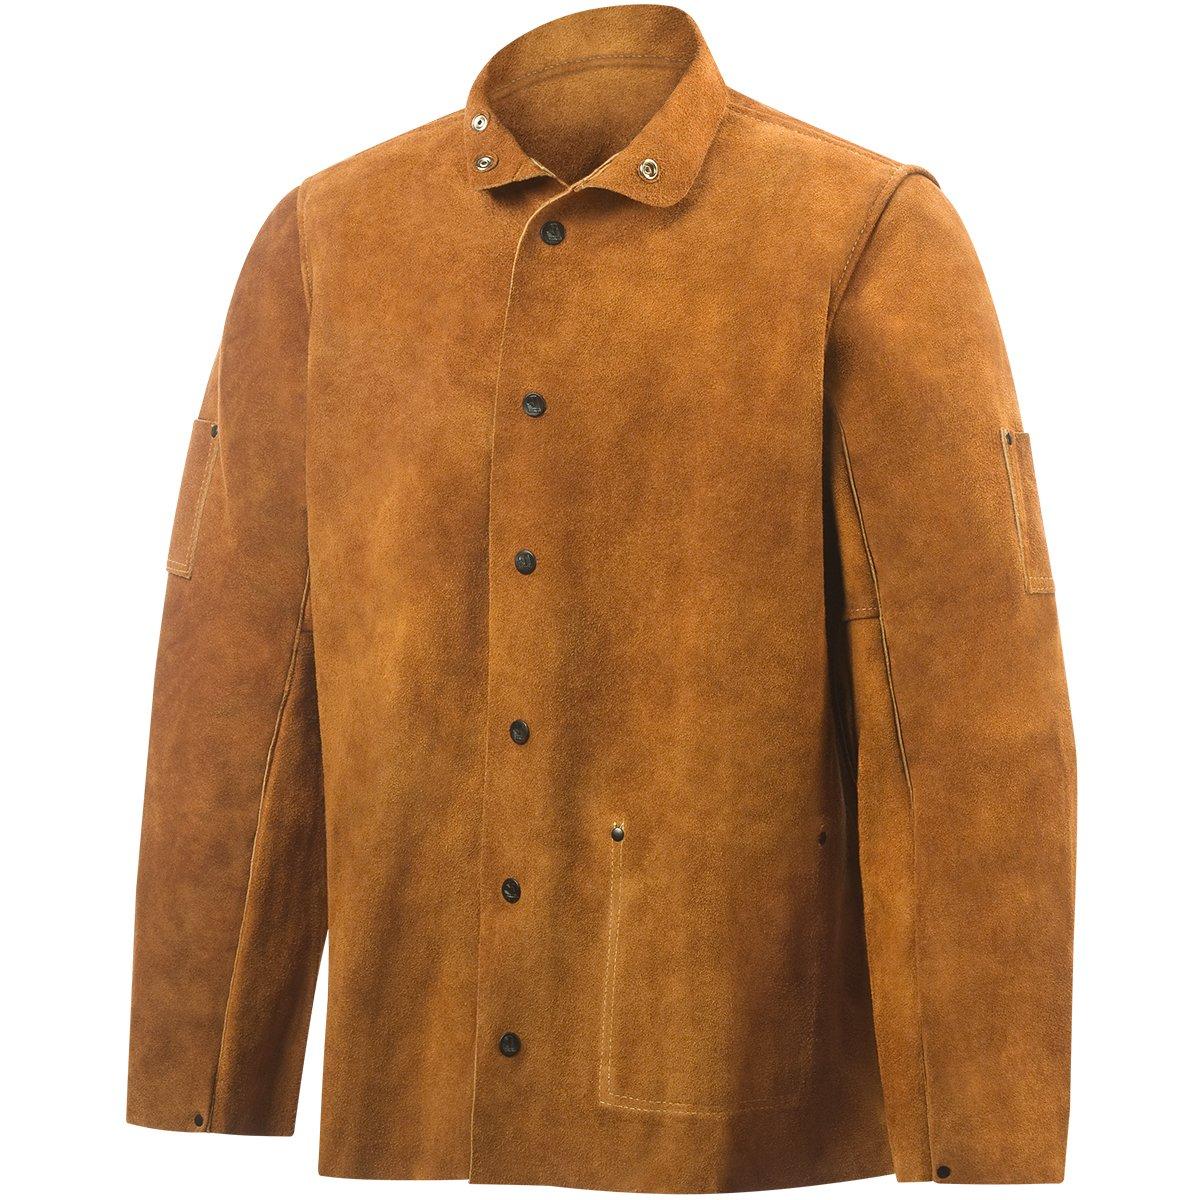 Steiner 9215-X 30-Inch Jacket, Weld-Rite Premium Brown Split Cowhide, Extra Large